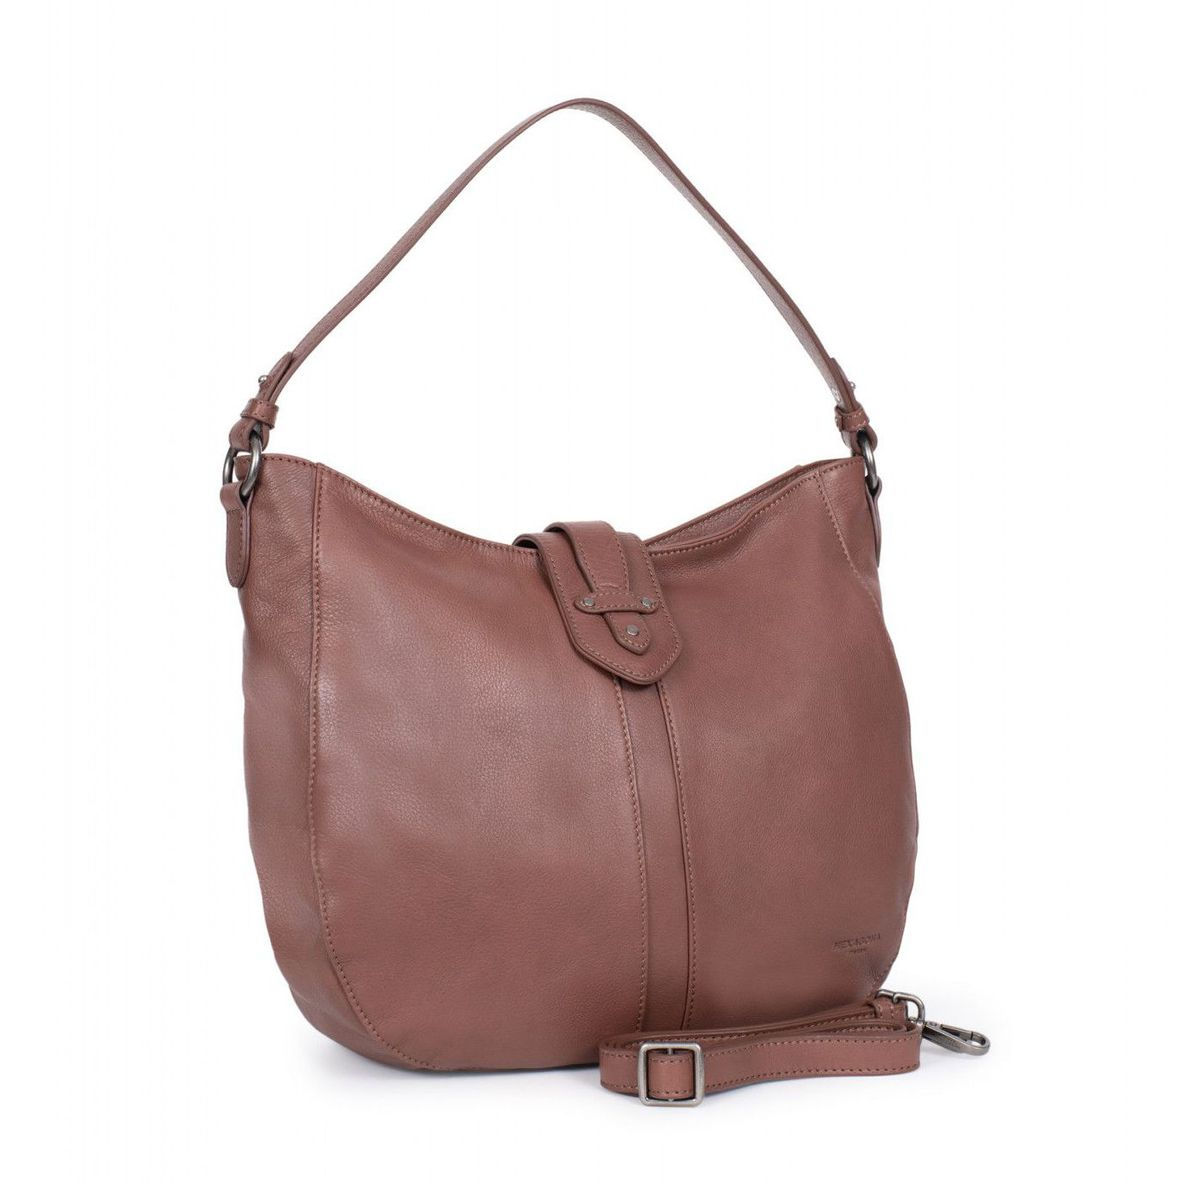 1. Cowhide leather bag Brown Hexagona